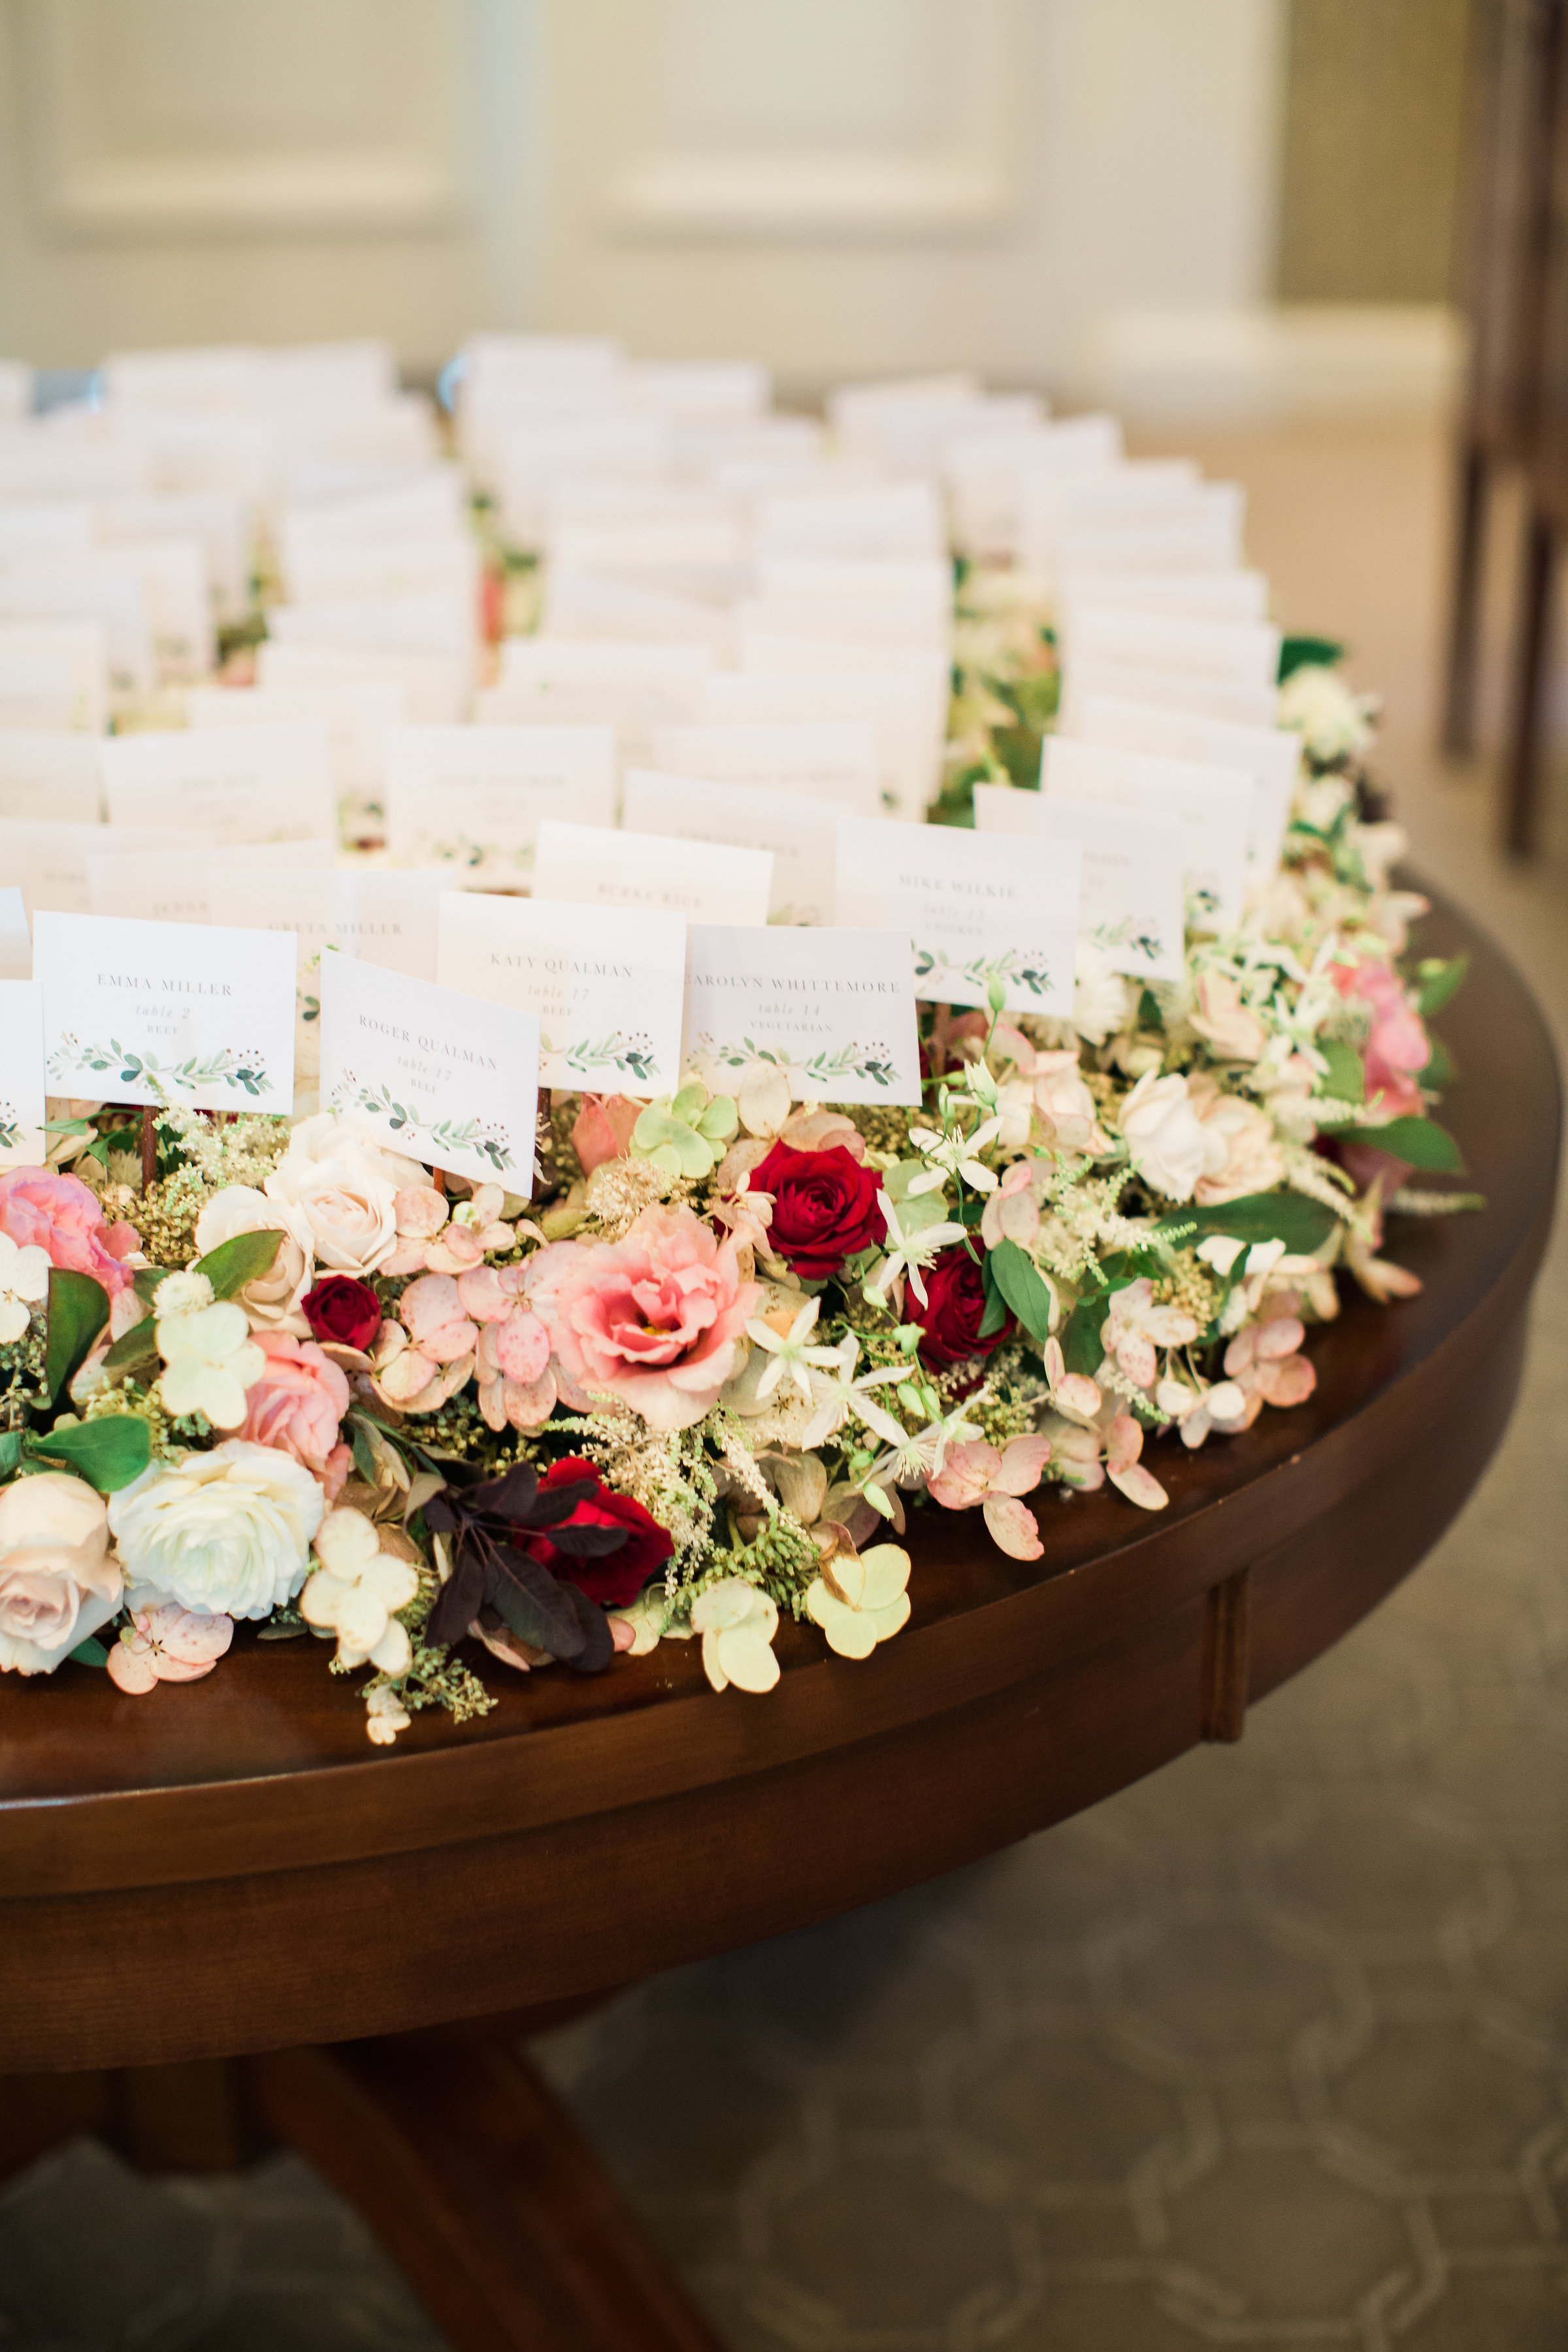 wedding floral accessories gallery portland 39 s wedding florist blum floral design. Black Bedroom Furniture Sets. Home Design Ideas